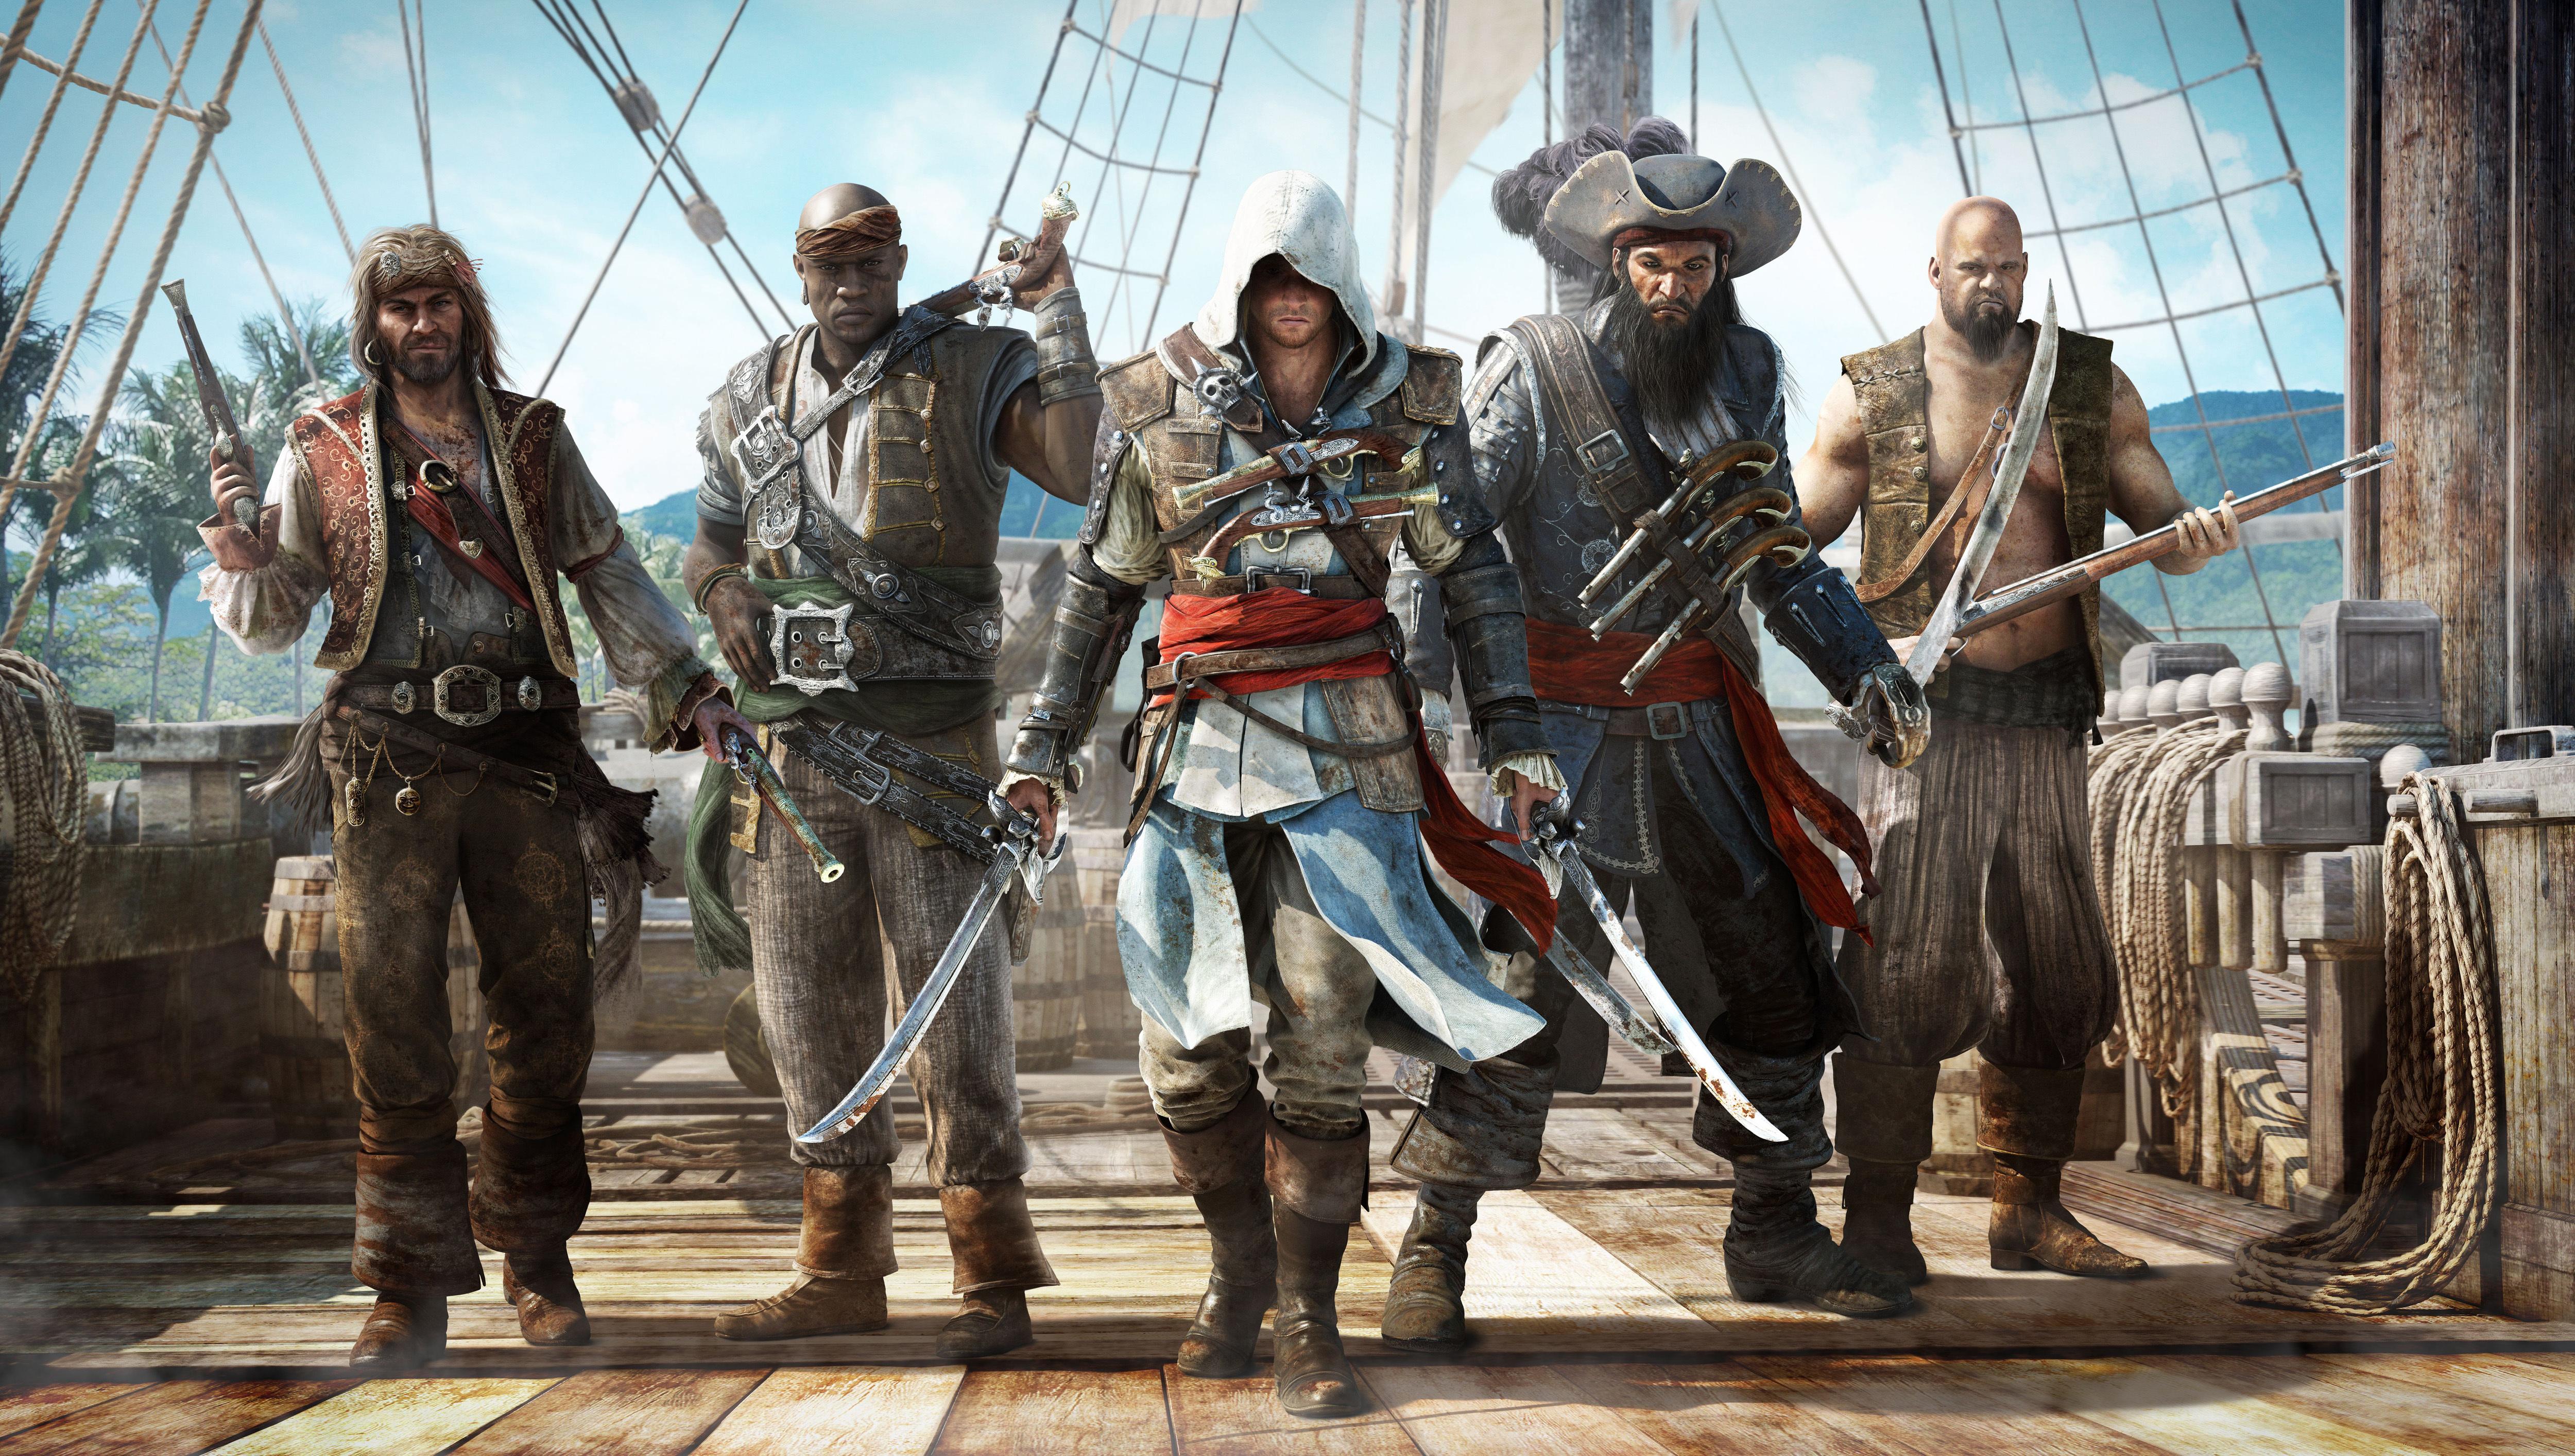 Assassin's Creed IV: Black Flag, Кредо Убийцы 4: Черный Флаг, пираты, ассасин обои скачать